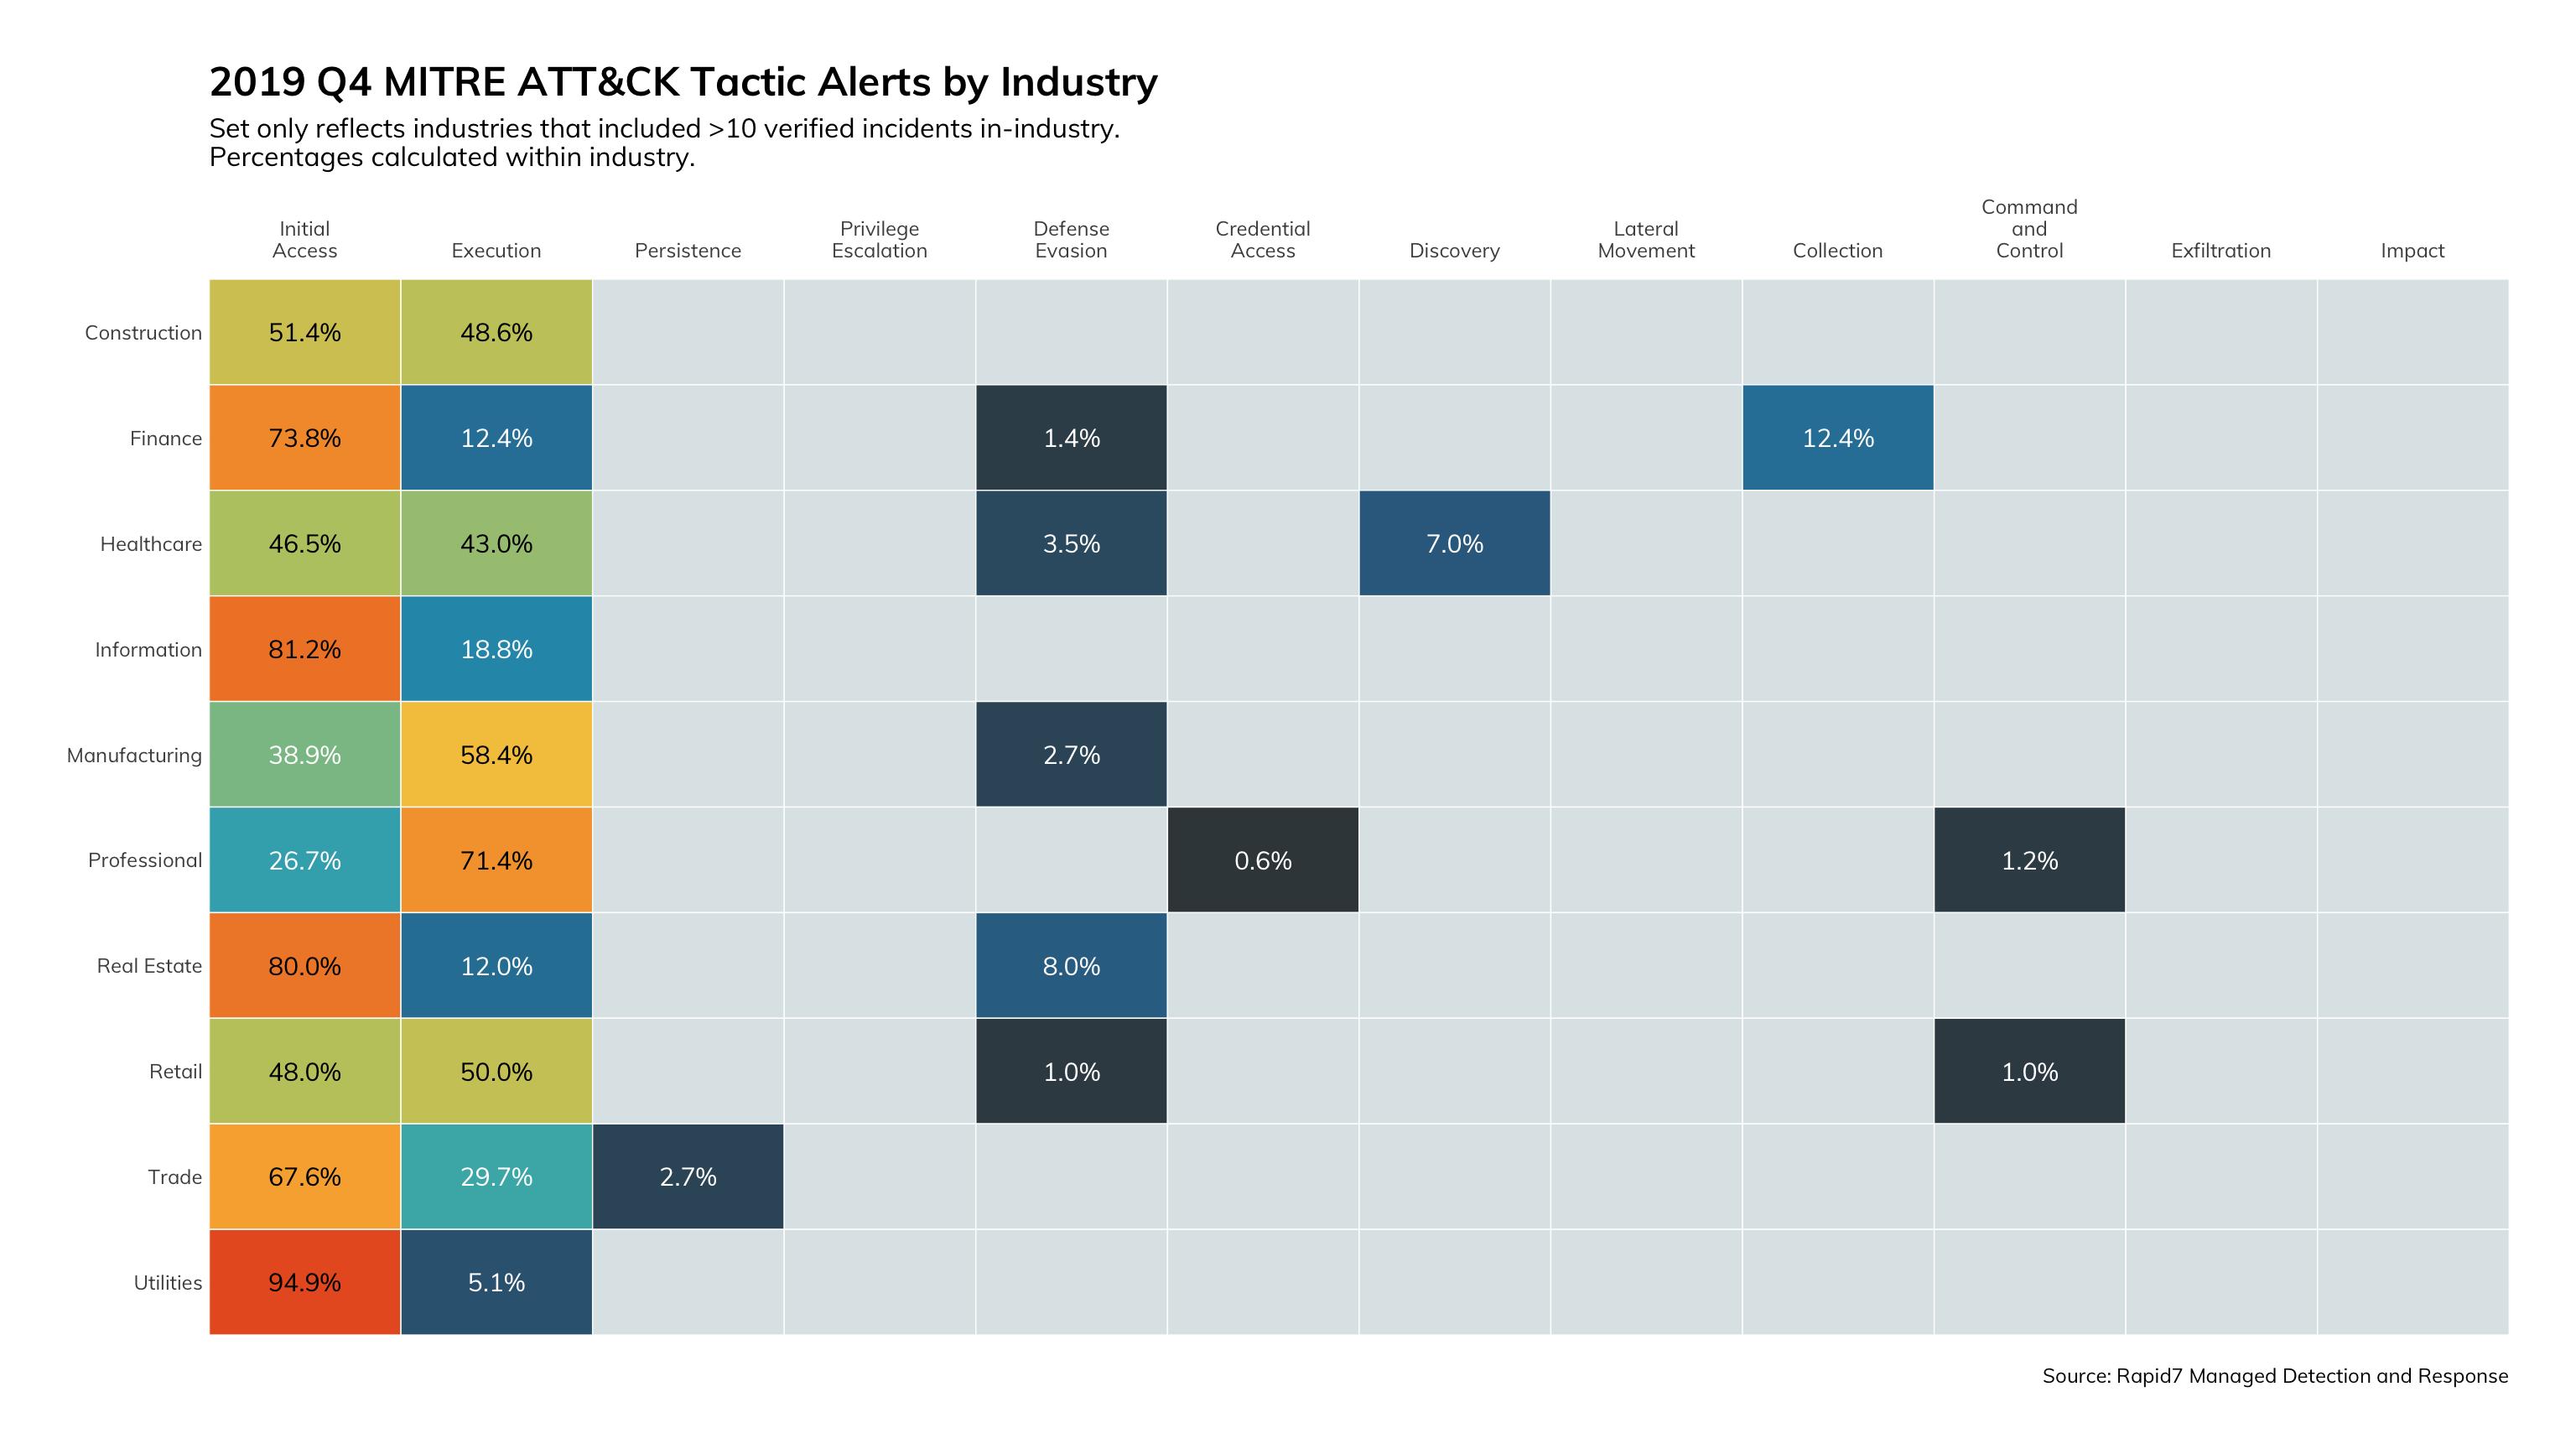 Figure 14: Q4 2019 Annual MITRE ATT&CK Tactic Alerts by Industry